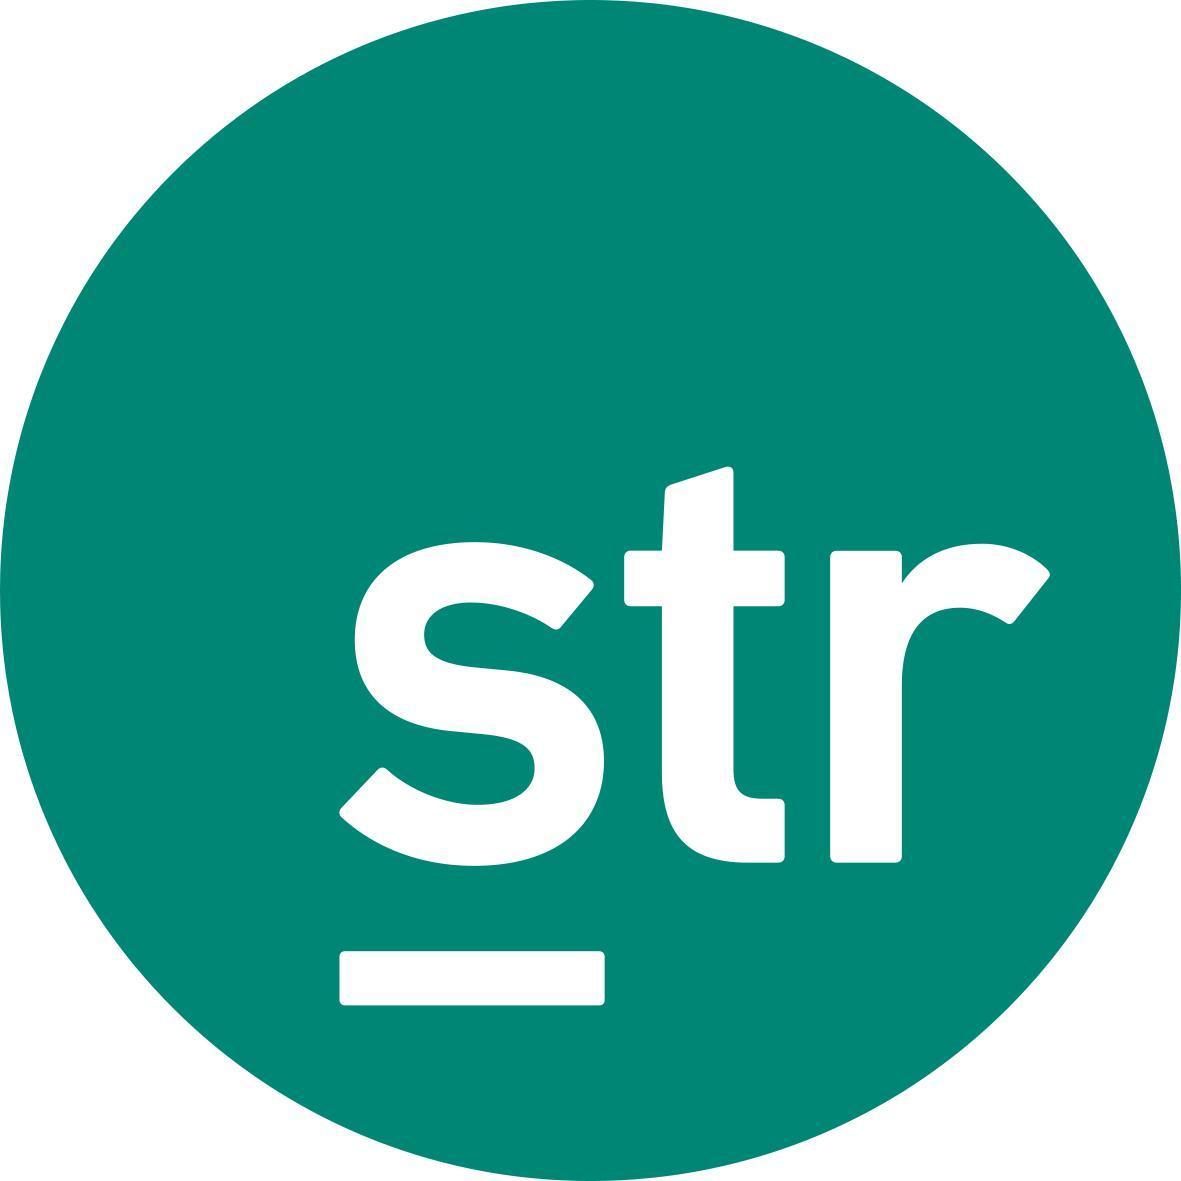 STR_FLAT_TEAL_WHITE_RGB_300dpi - Copy.jpg